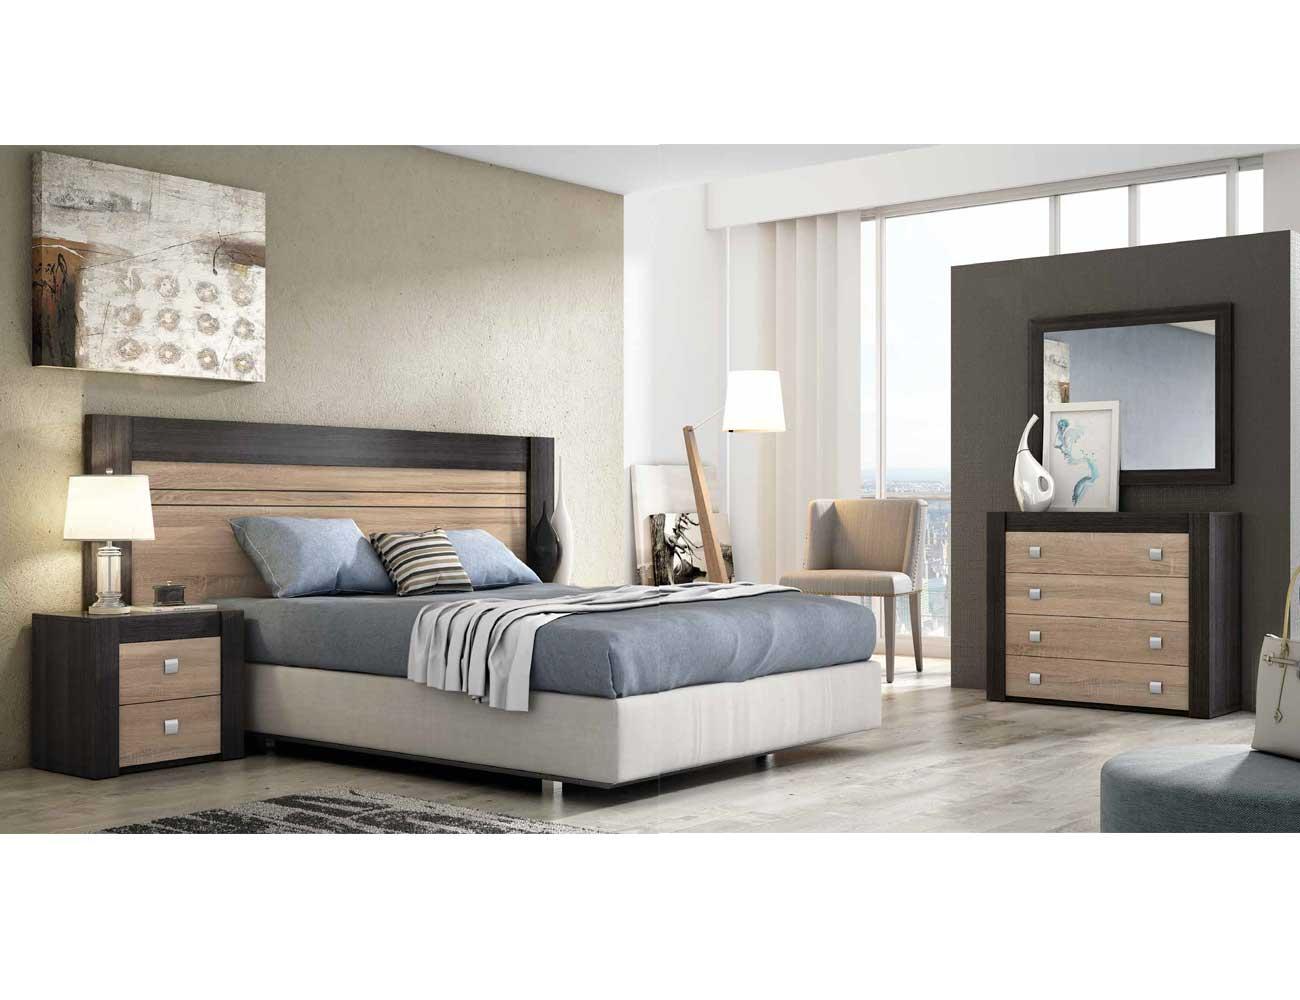 Dormitorio moderno ceniza cambrian 03